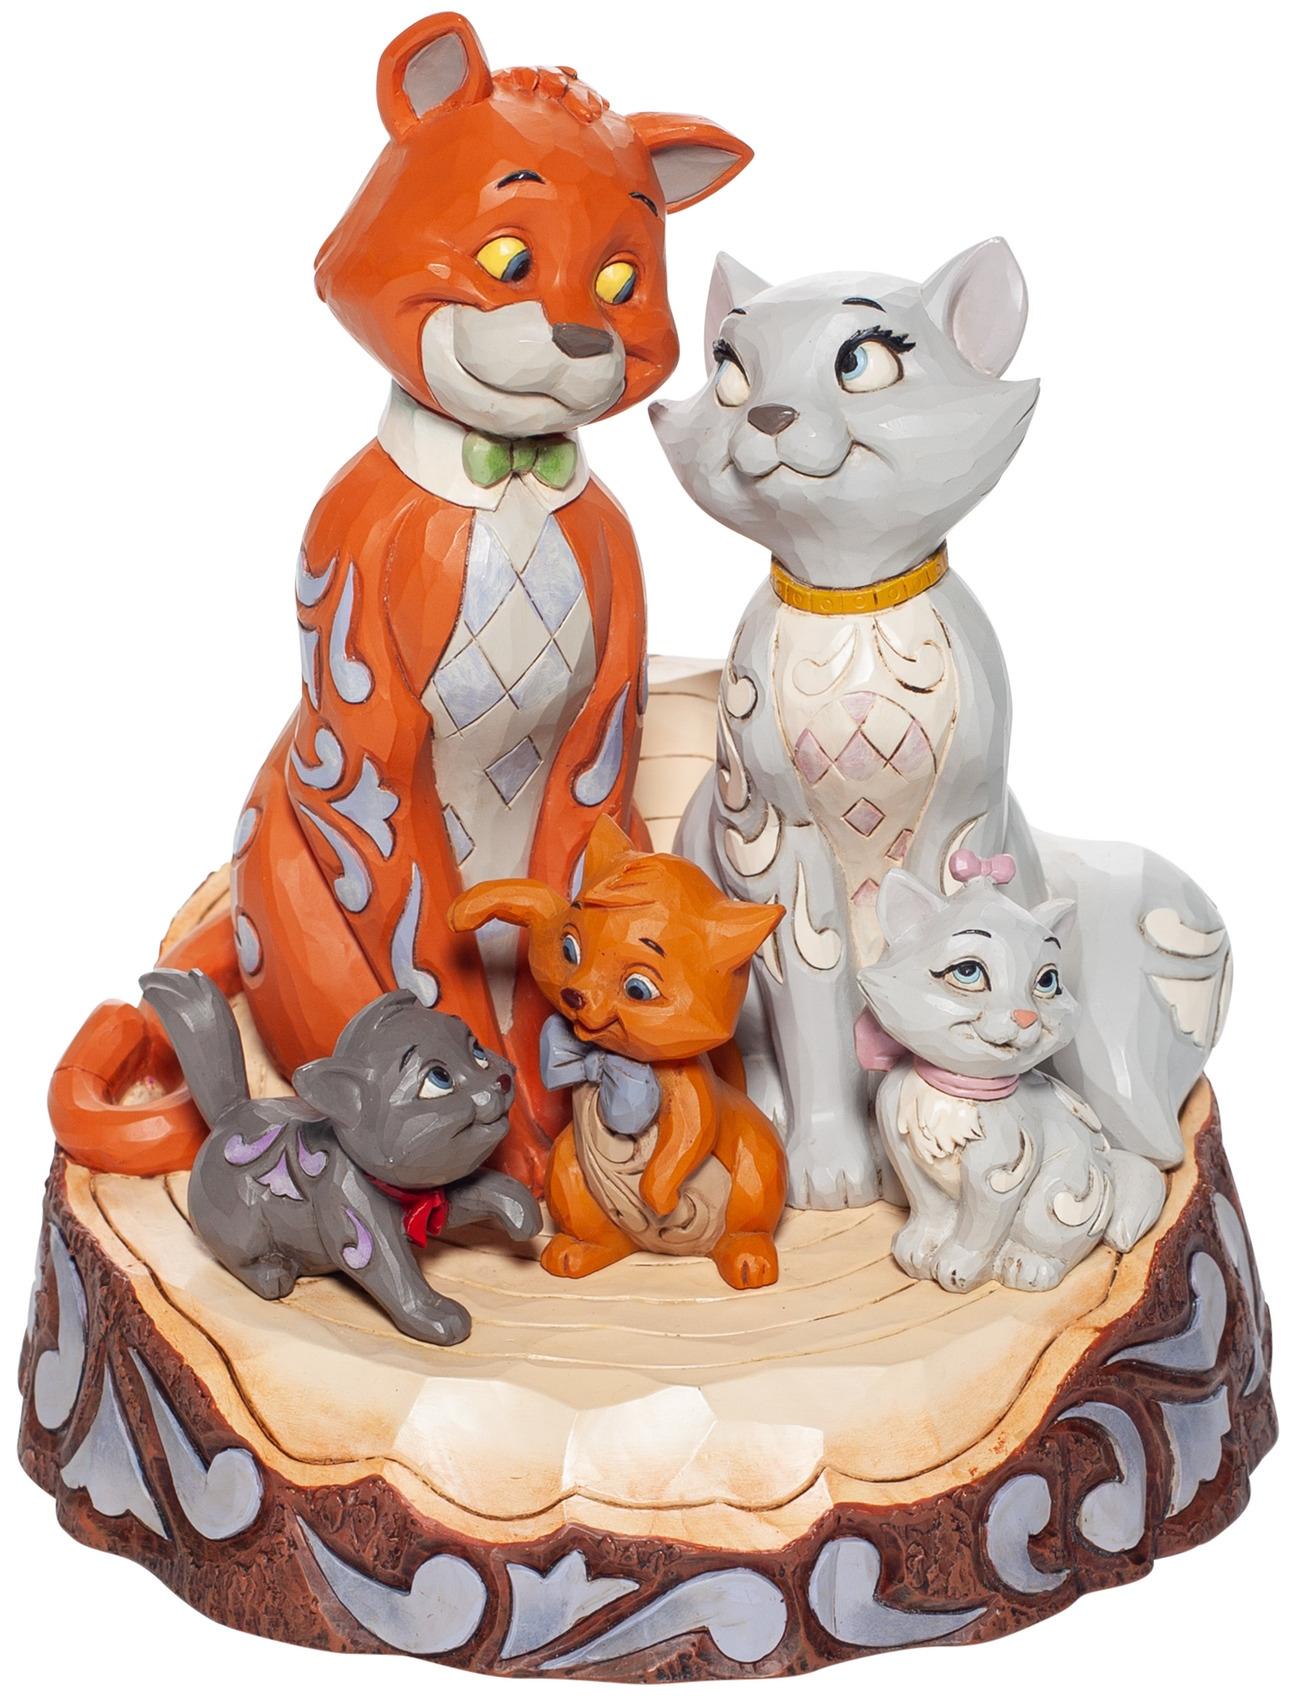 Jim Shore Disney 6007057N Aristocats Figurine